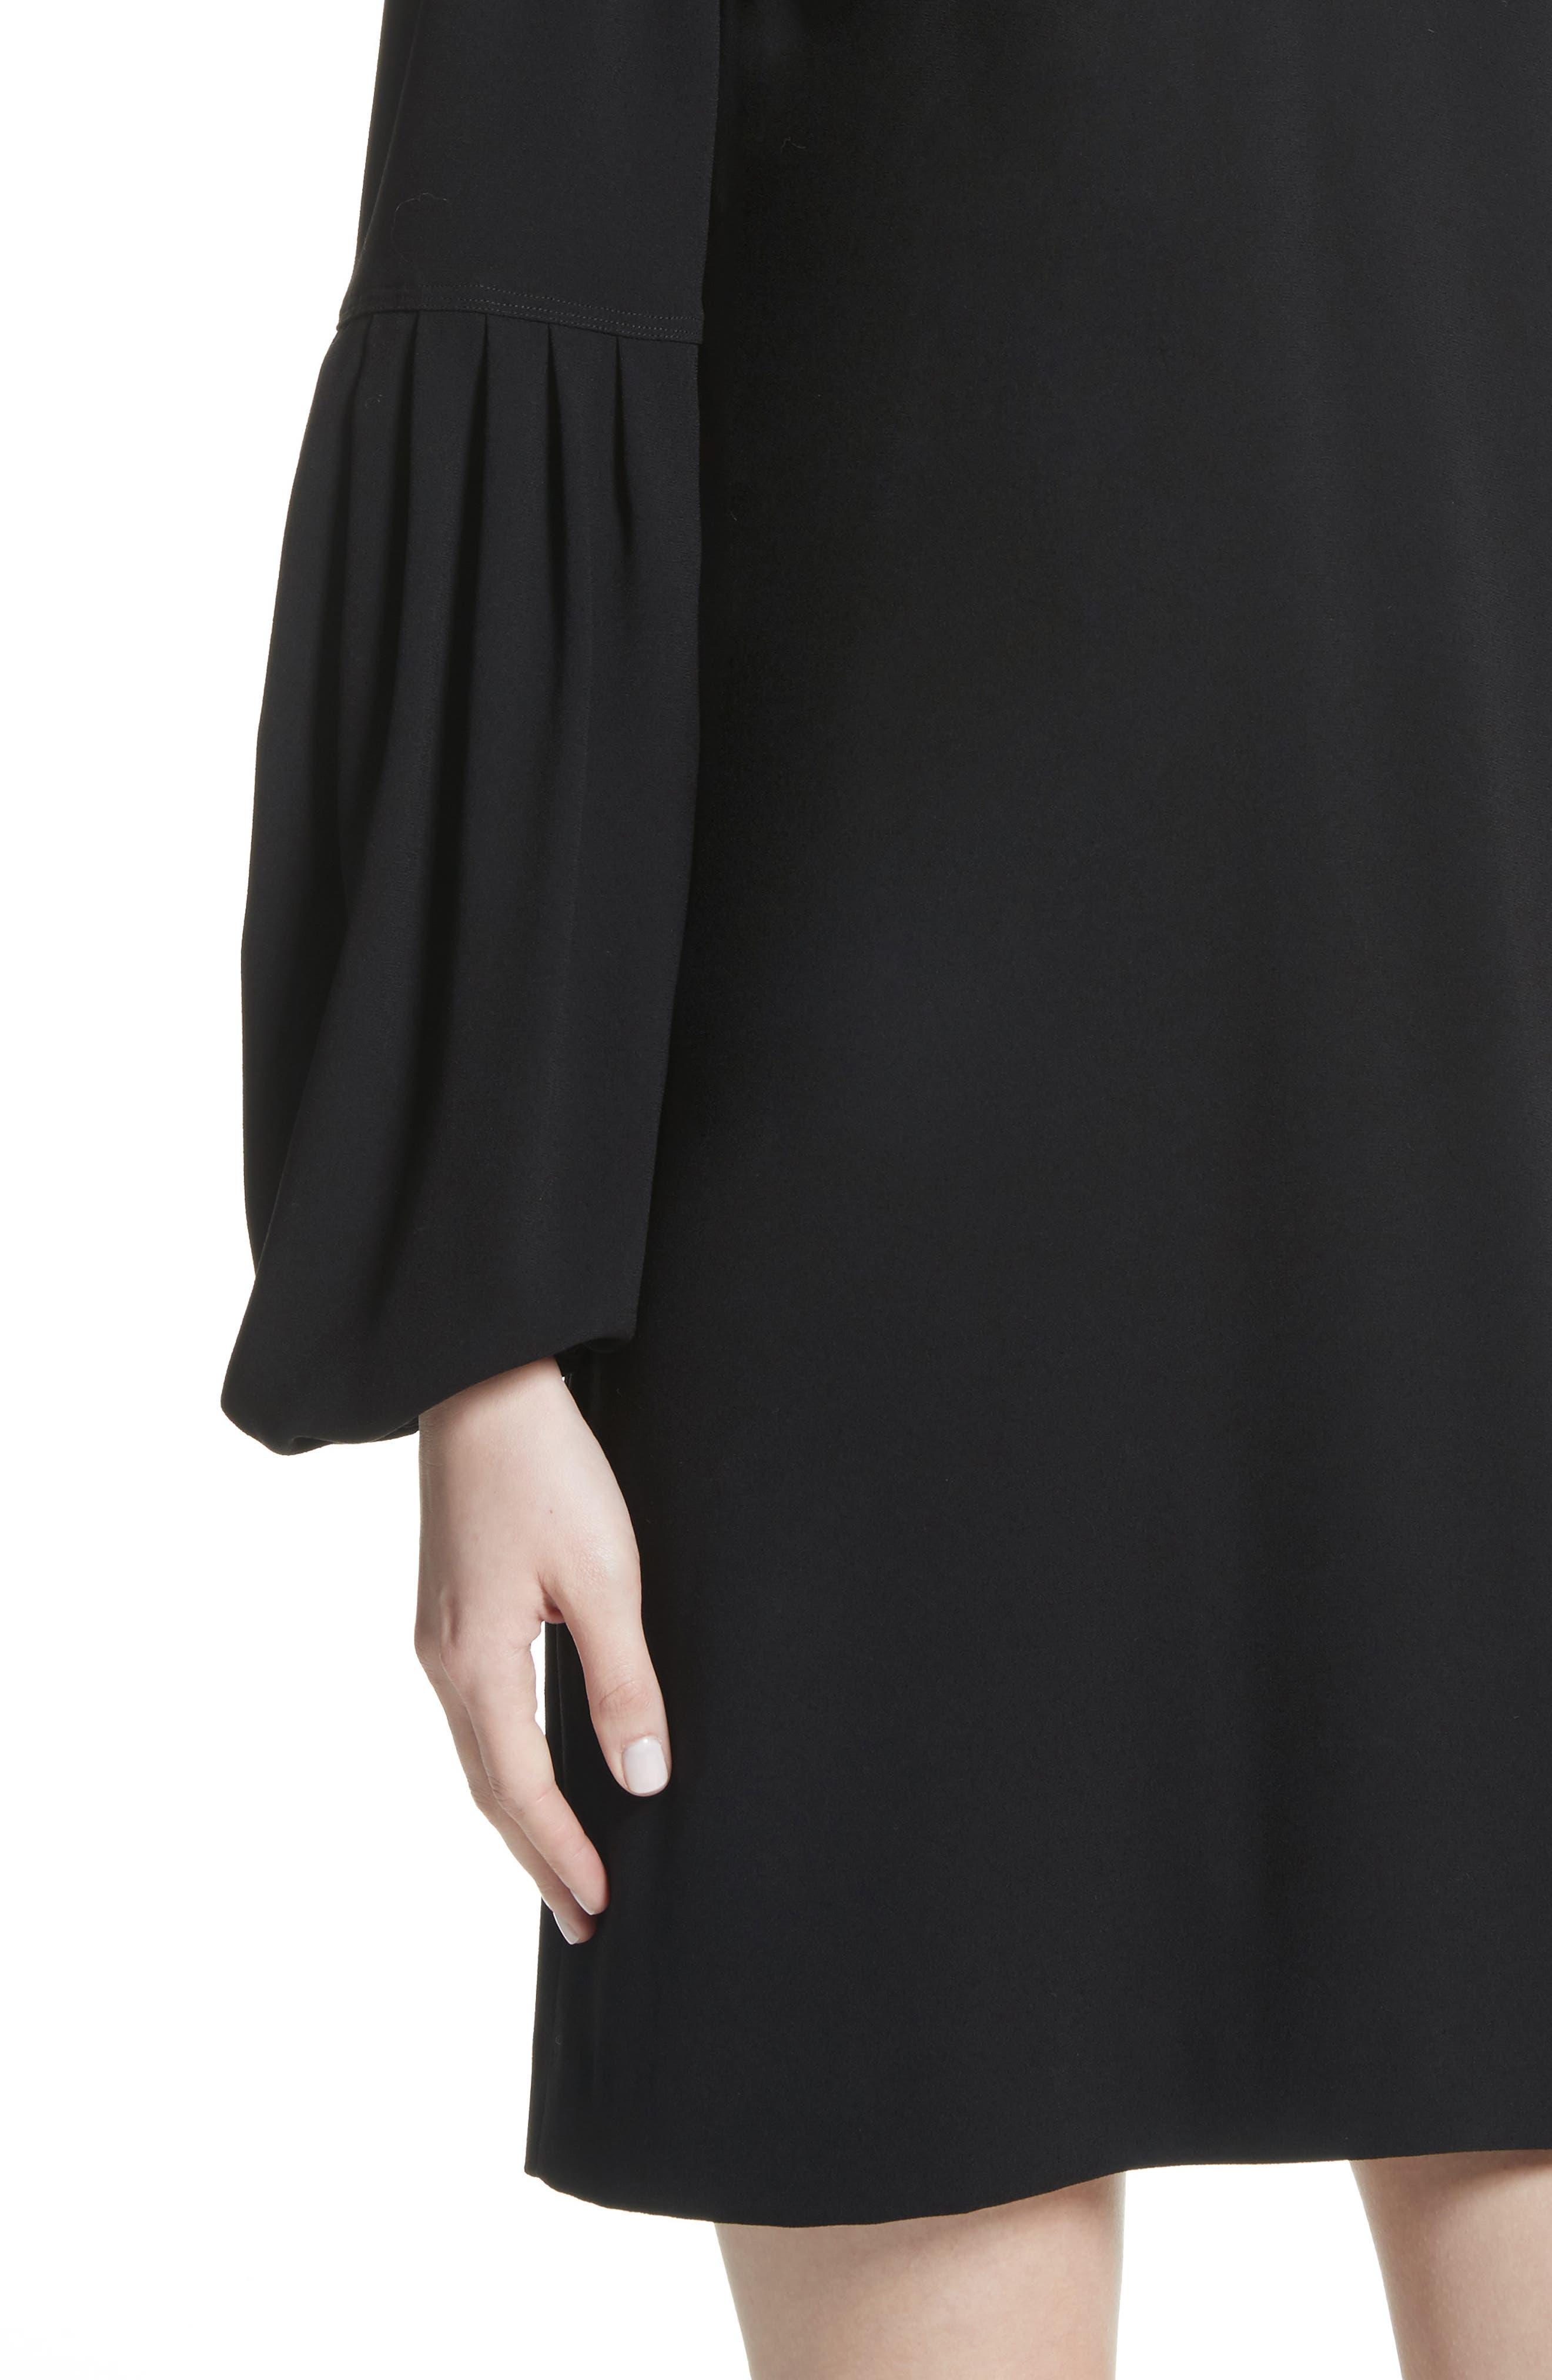 Claudia Puff Sleeve Dress,                             Alternate thumbnail 4, color,                             001